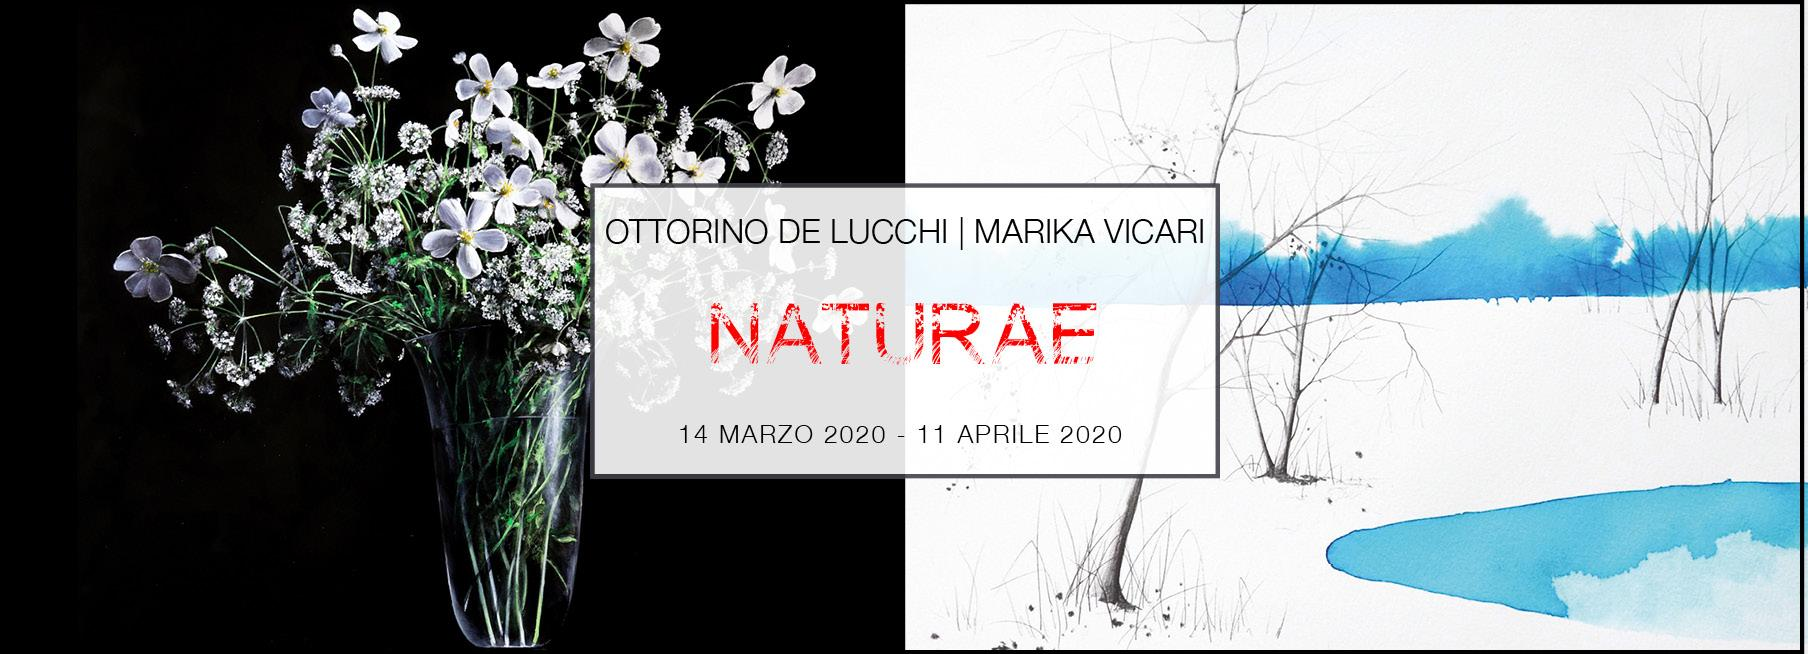 OTTORINO DE LUCCHI - MARIKA VICARI   NATURAE